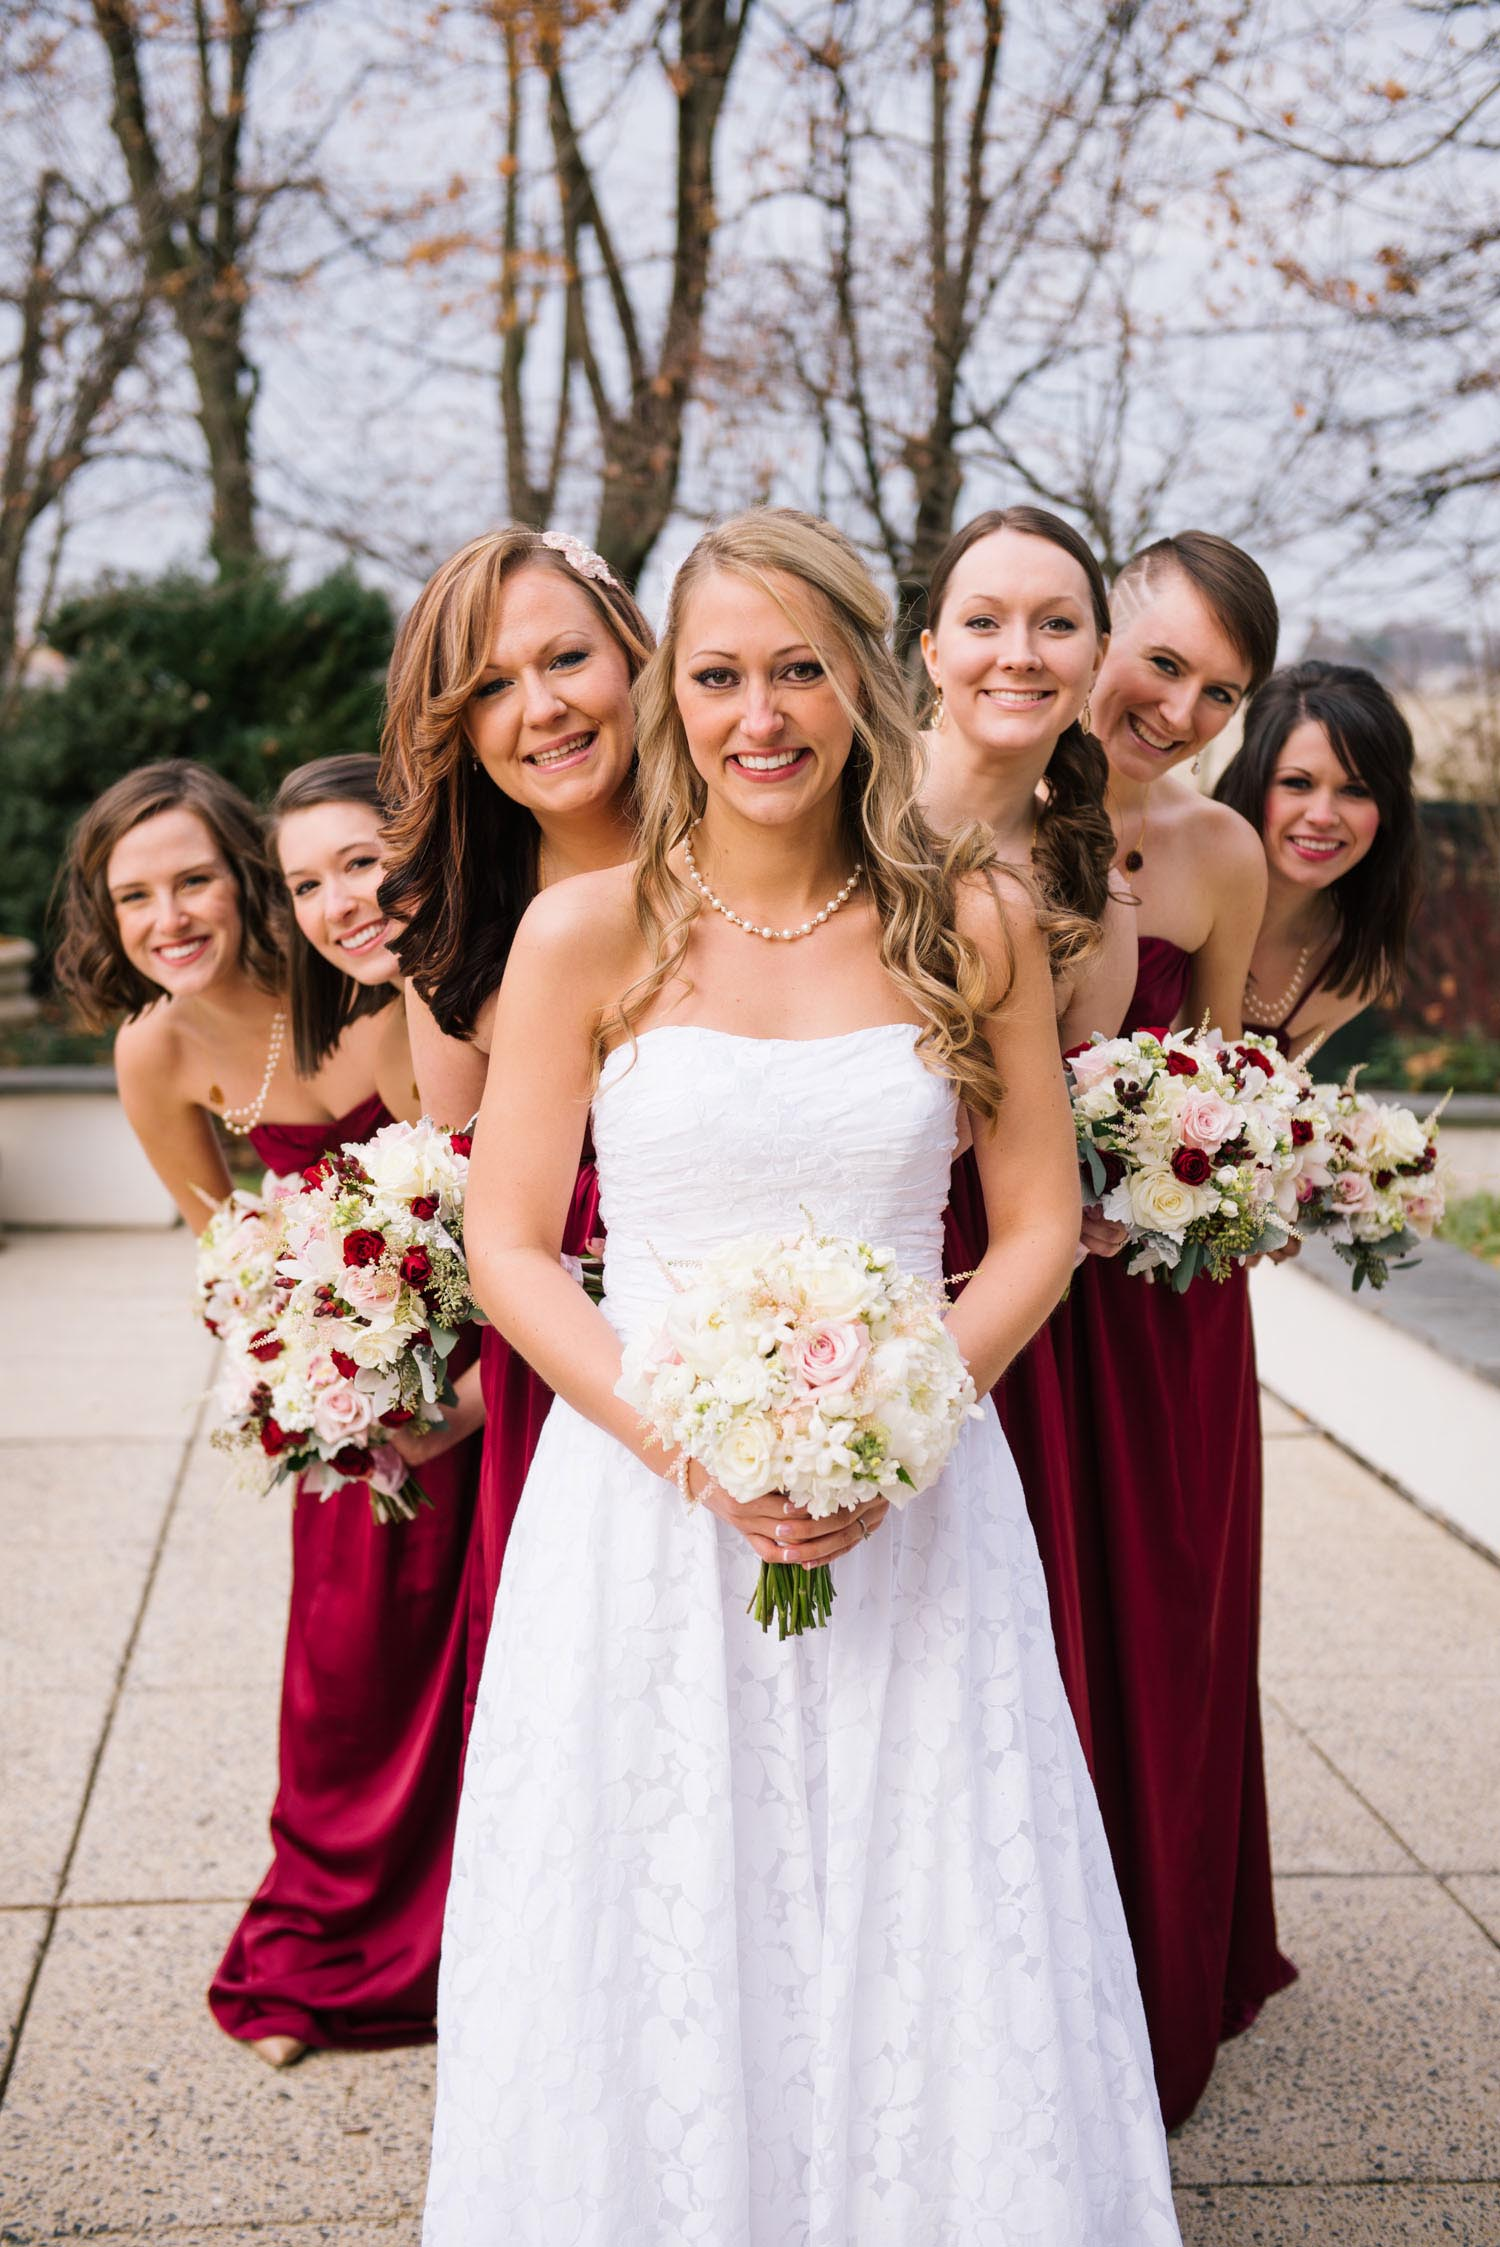 youngstrom-wedding-53.jpg